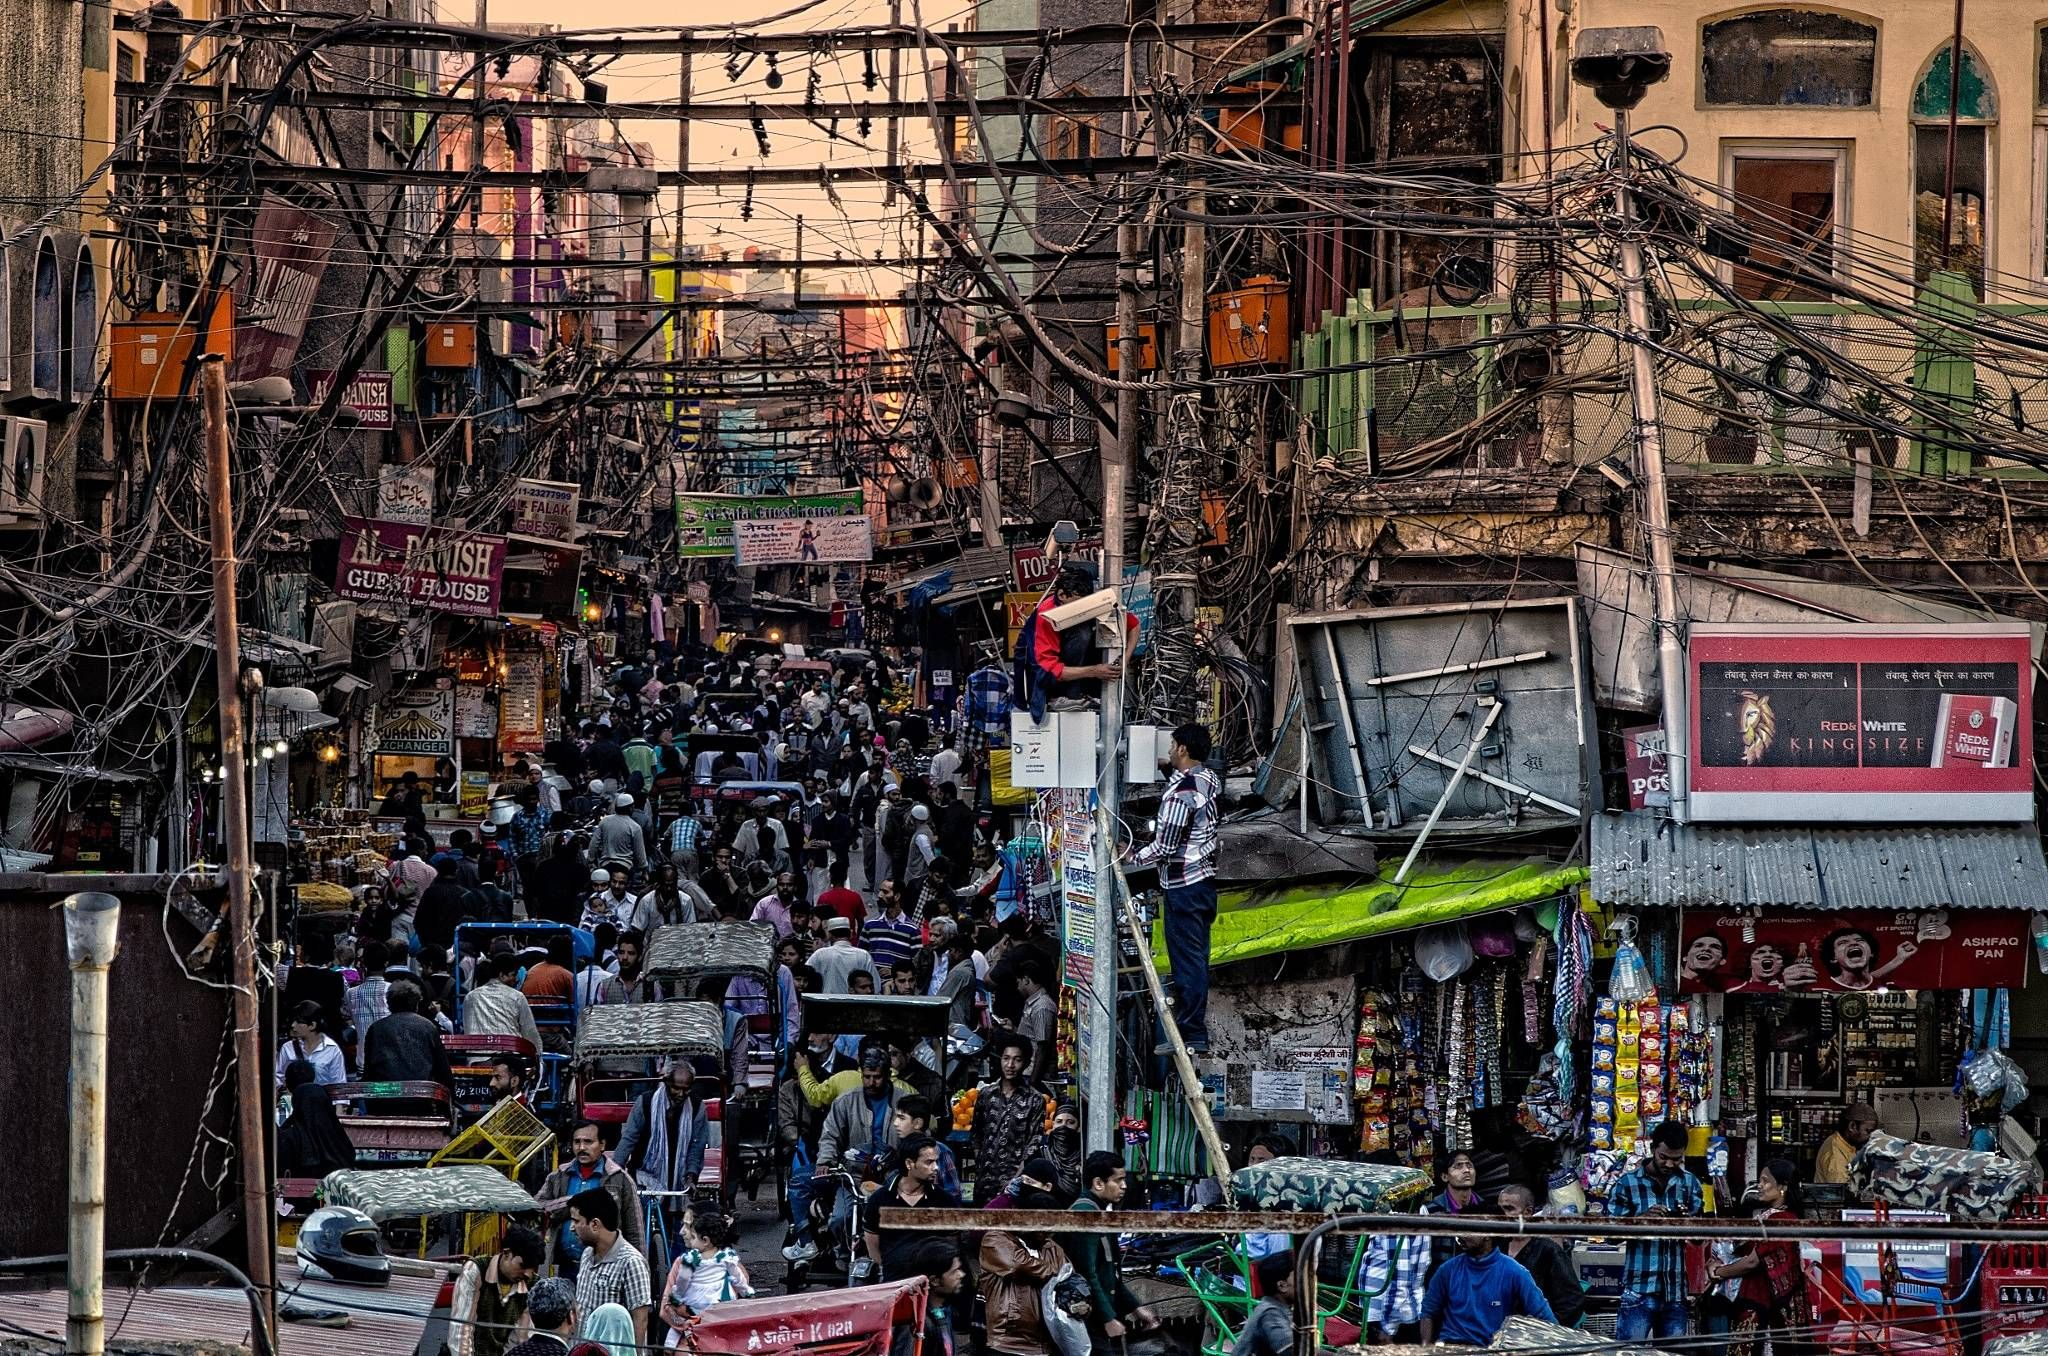 INDIA [2048x1356] Top reddit wallpapers 4k wallpaper